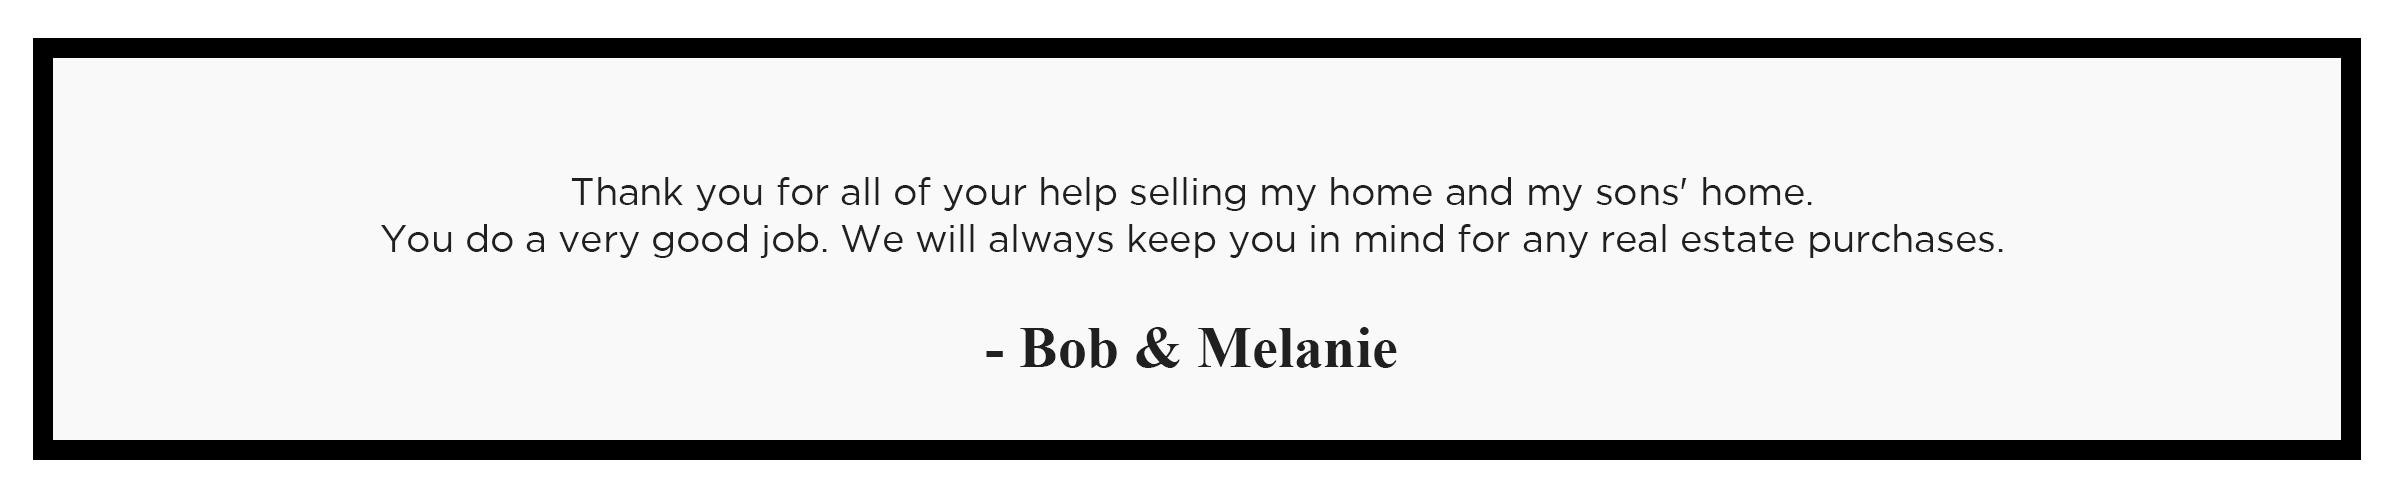 01 - bob & melanie